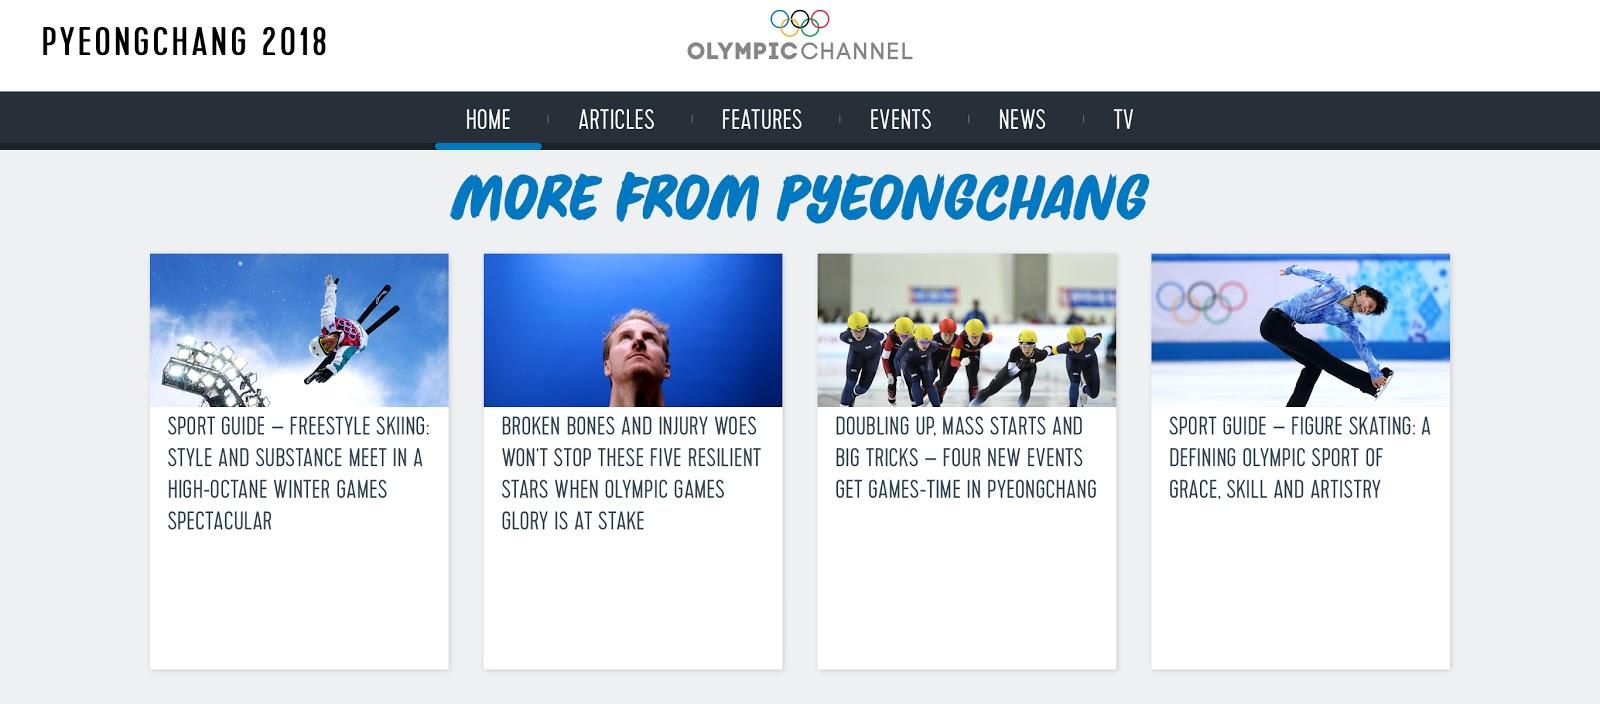 PyeongChang on Olympics Channel